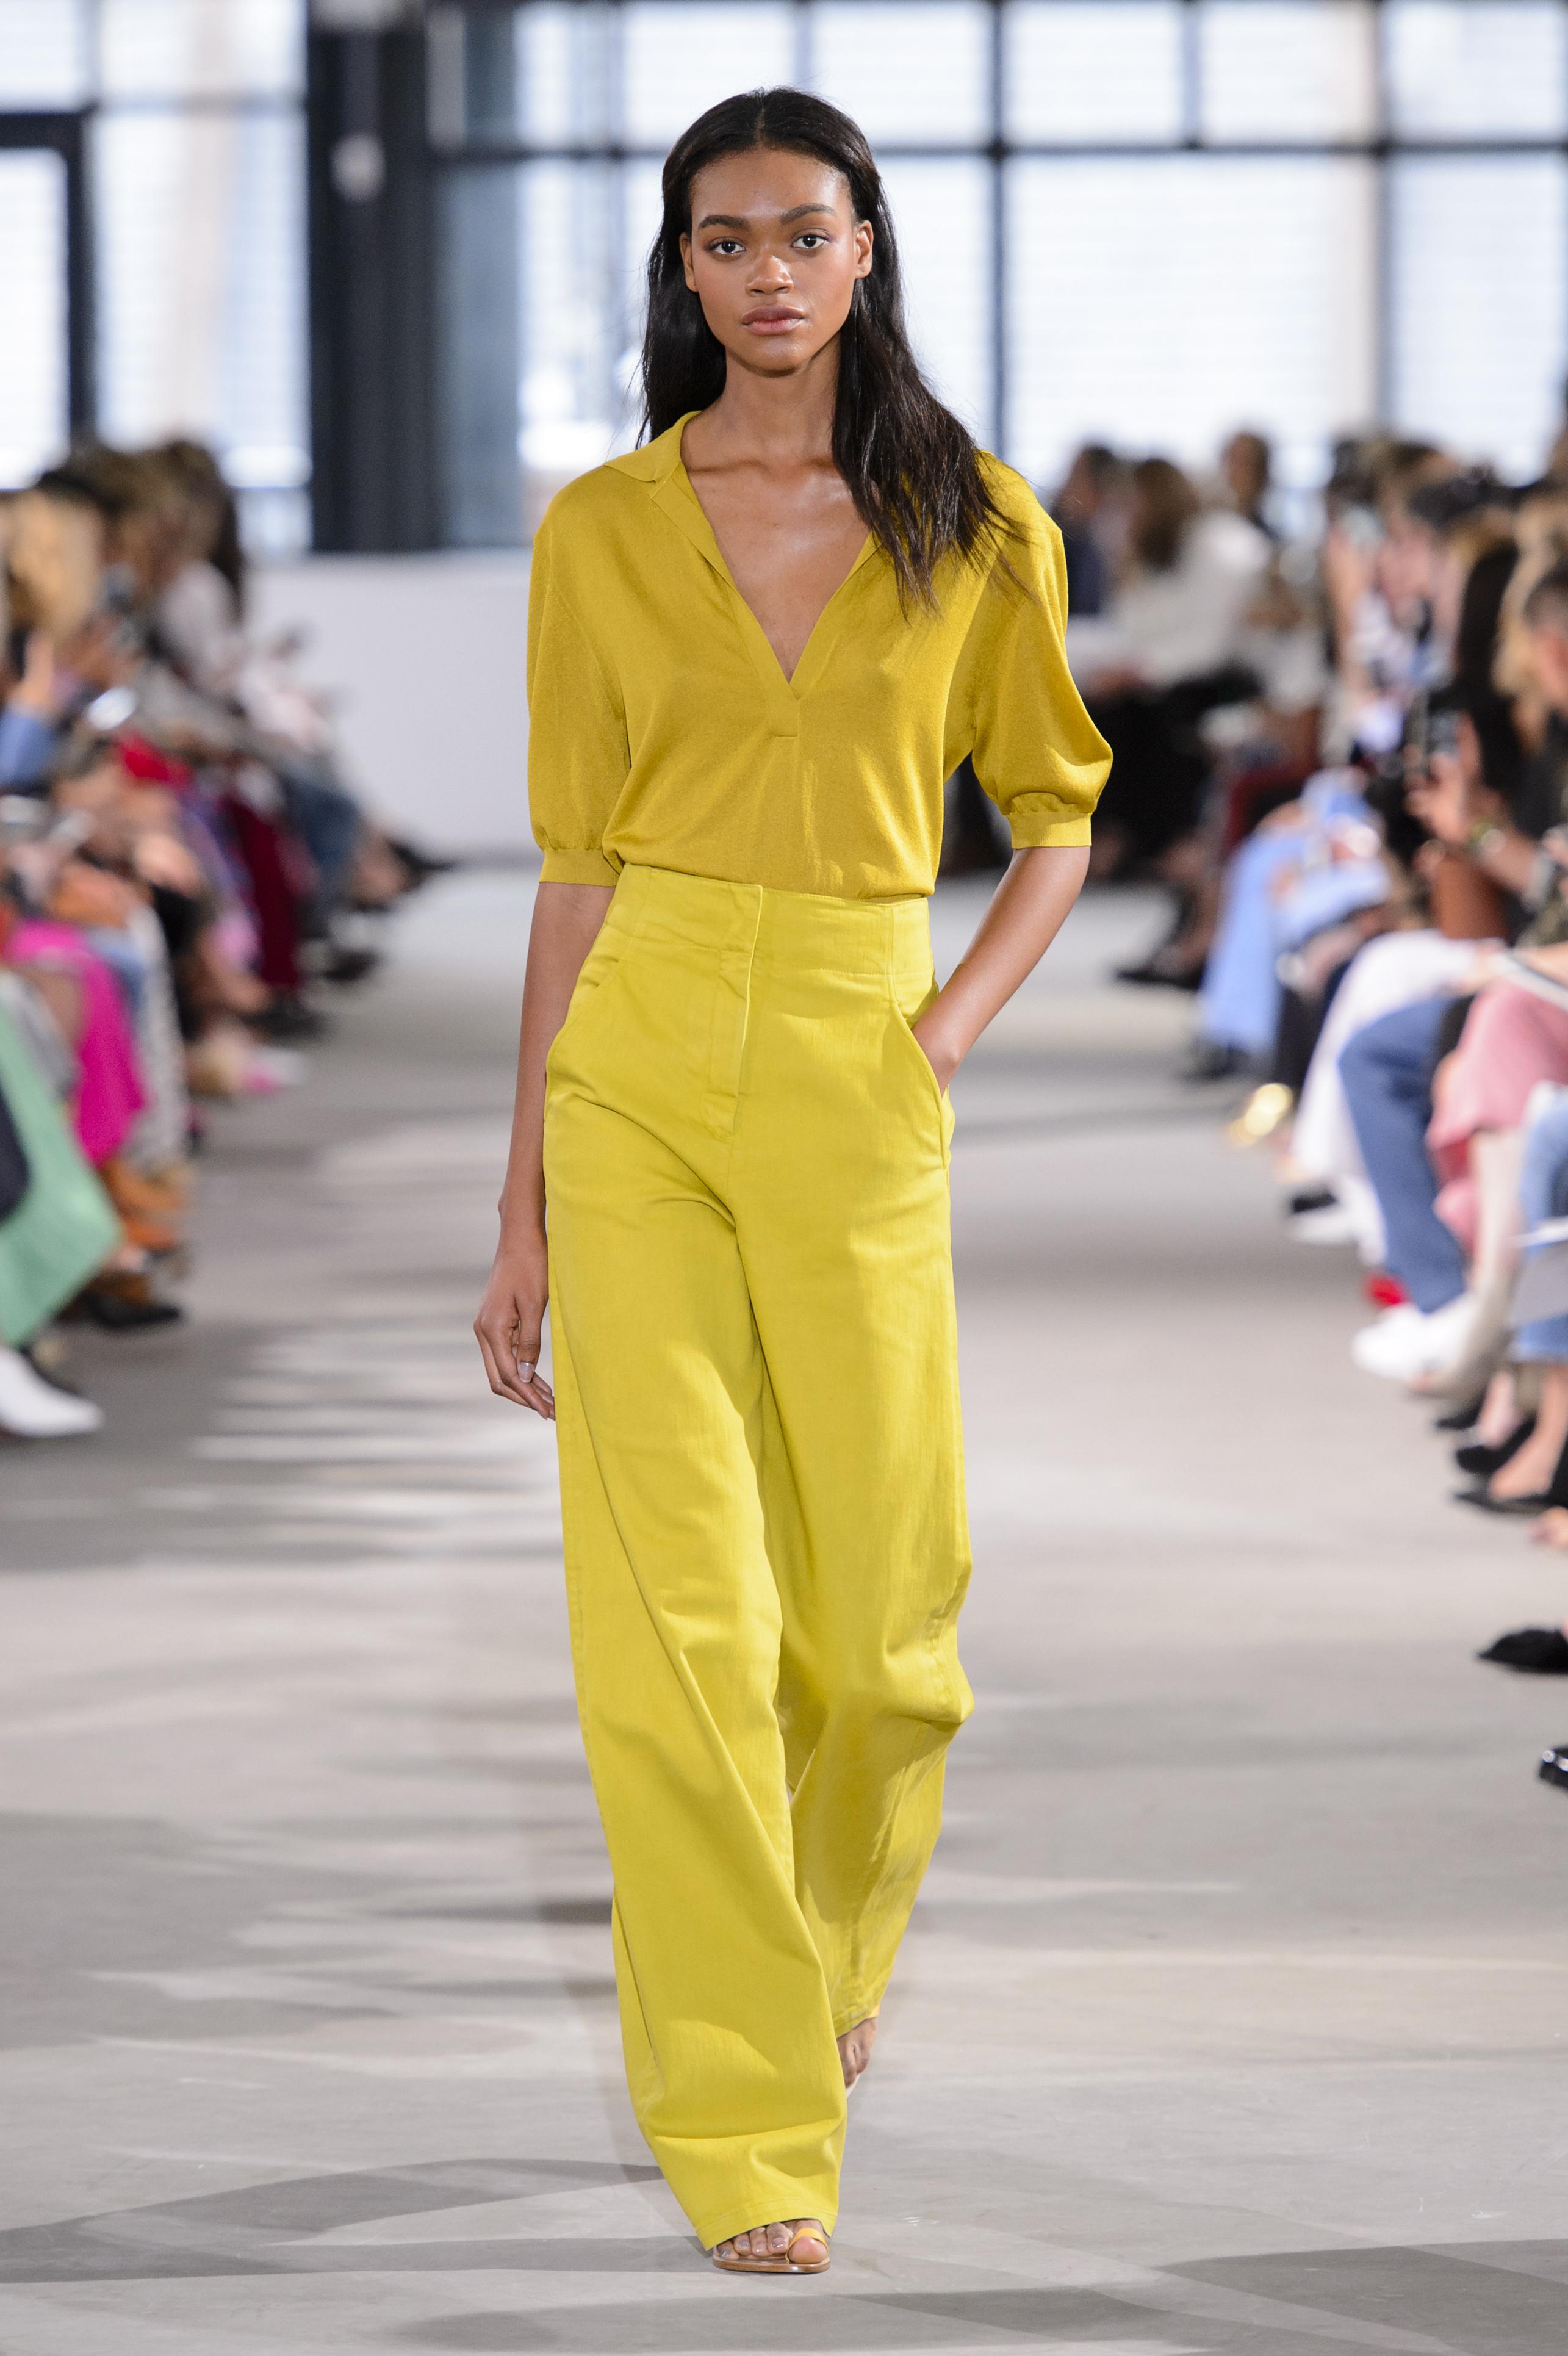 Желтая блузка с вырезом